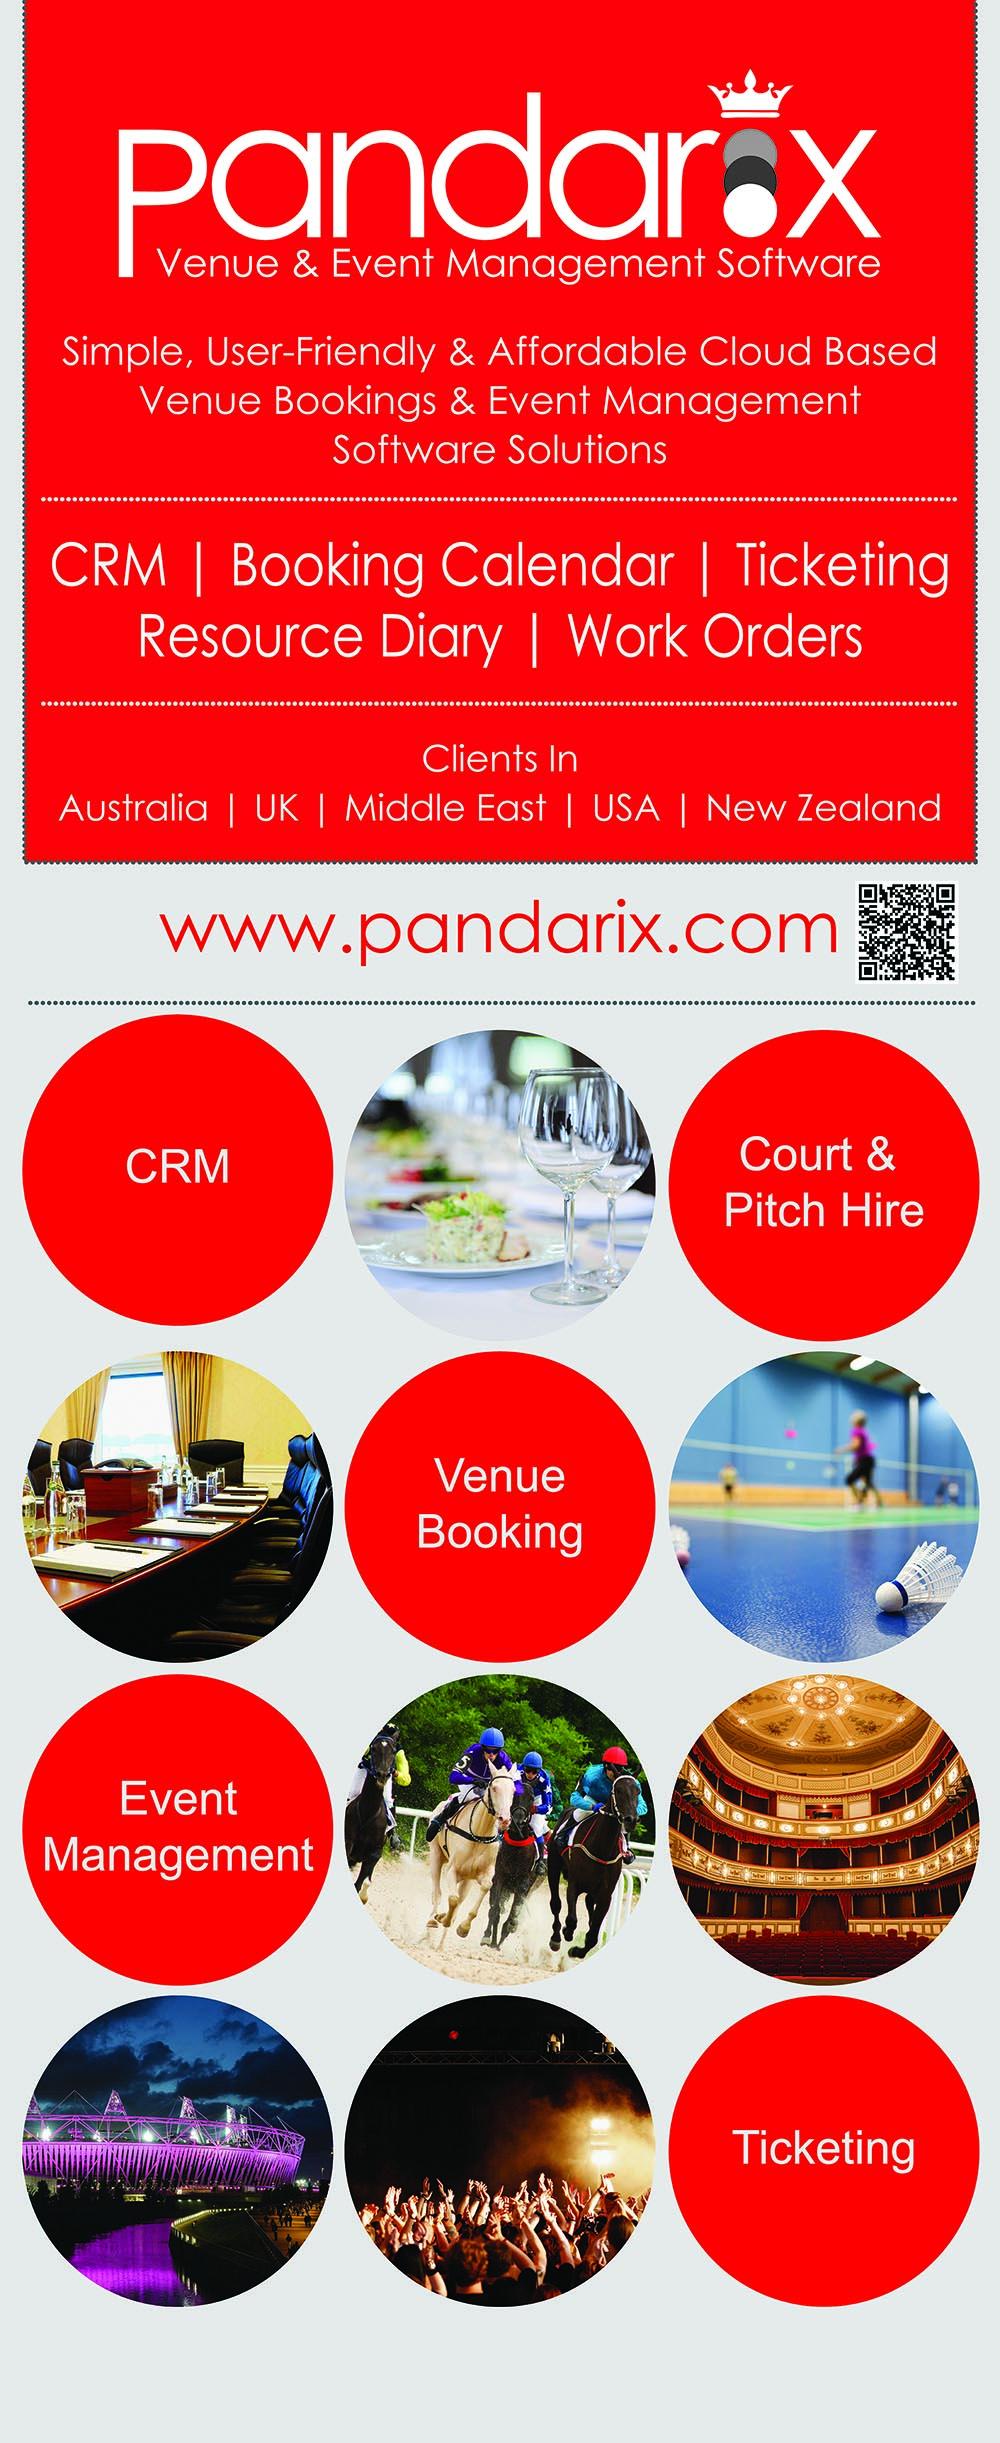 Pandarix Red Banner